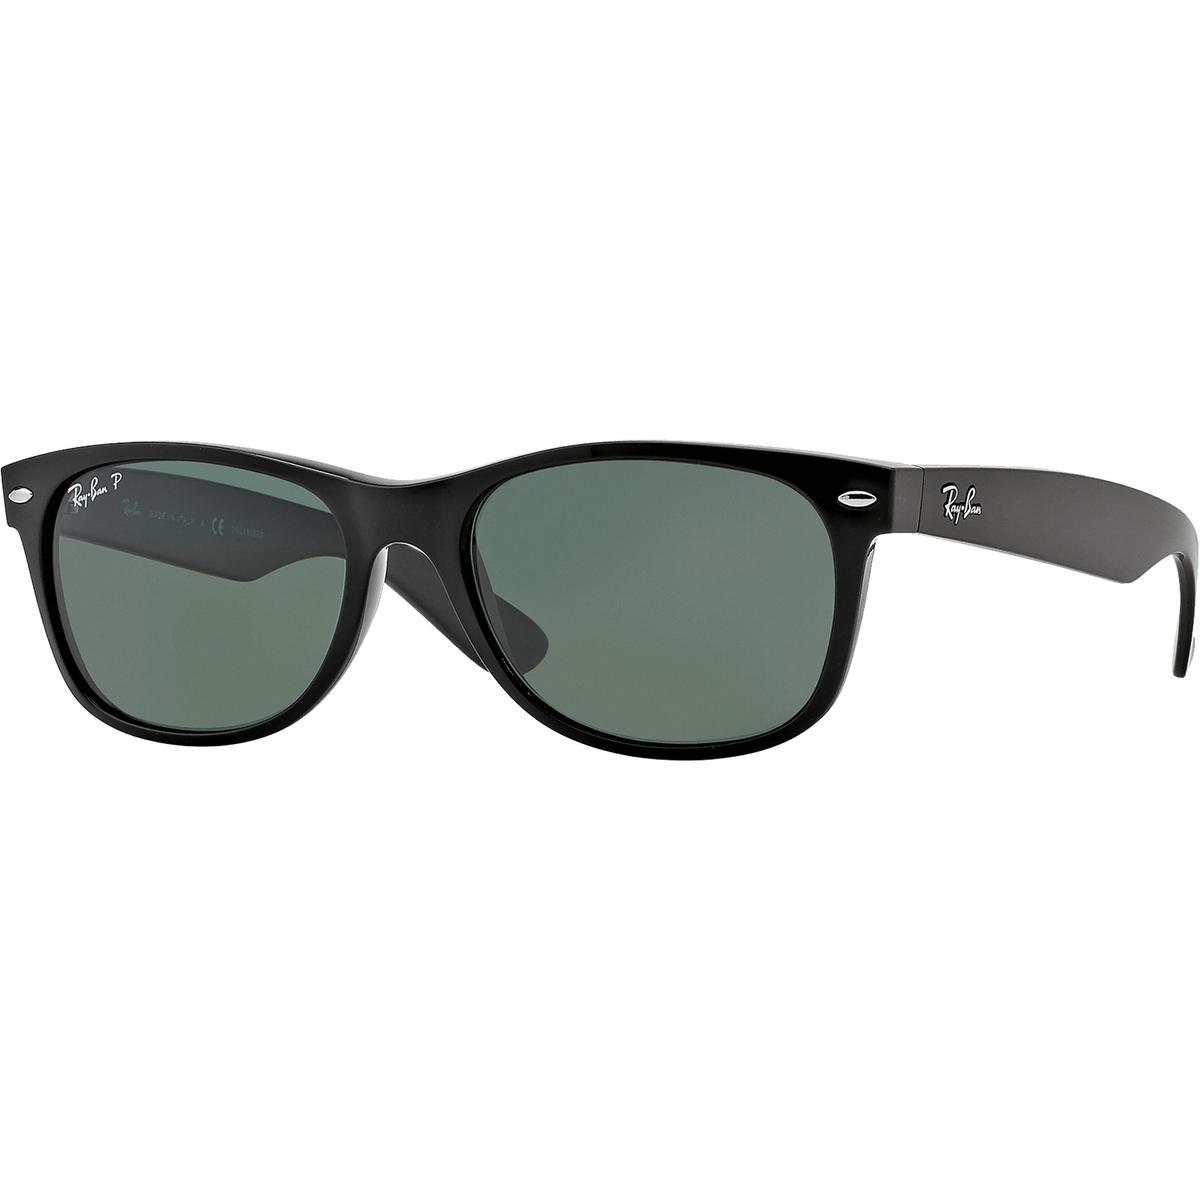 982667c4e7 Ray-Ban Polarized New Wayfarer Sunglasses - Black Green  0RB21329015855